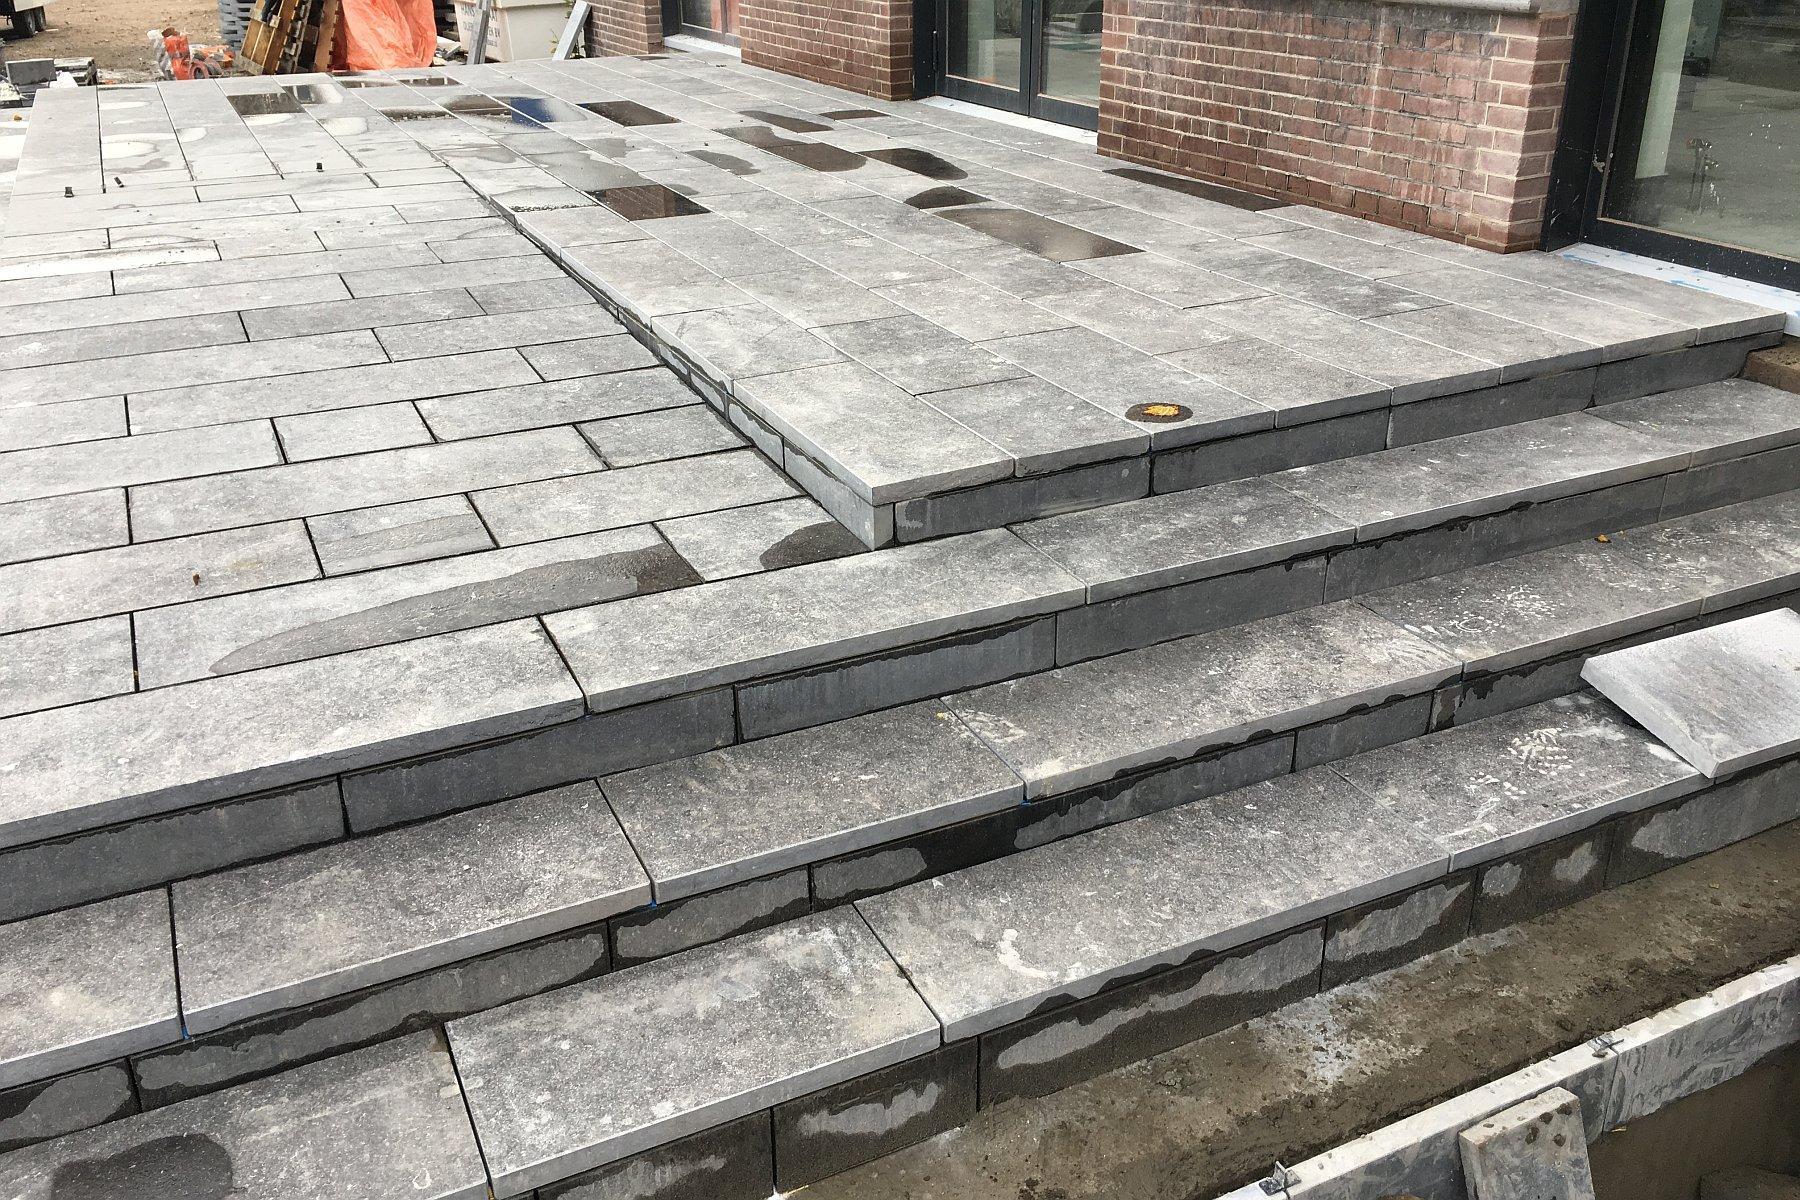 Betonnen Trap Voorbeelden : Betonnen trap tuin